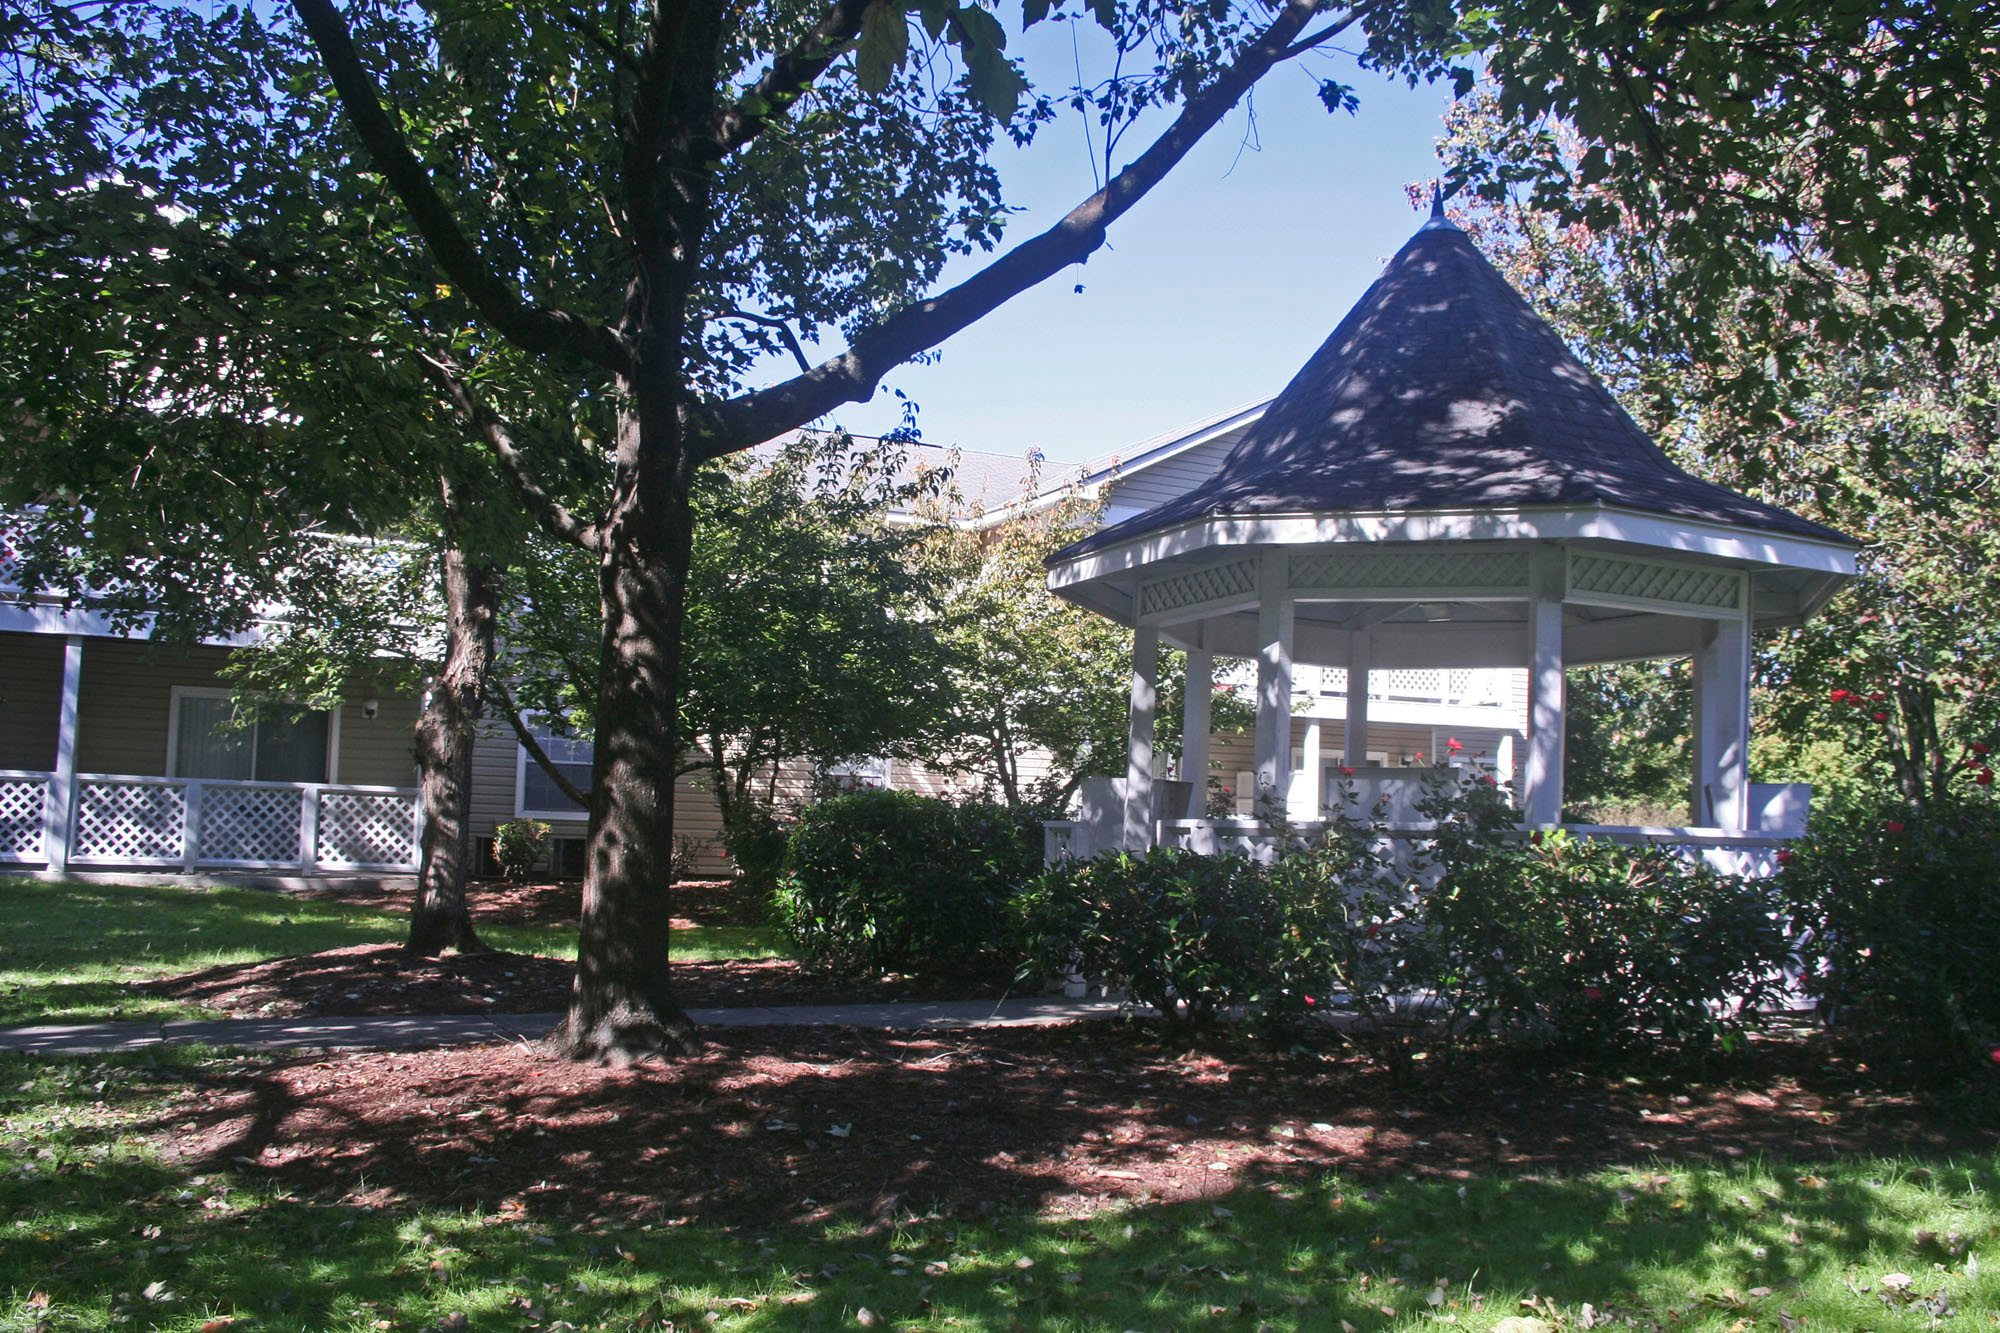 Cypress Pointe, Wilmington, NC has Gazebo and Picnic Areas